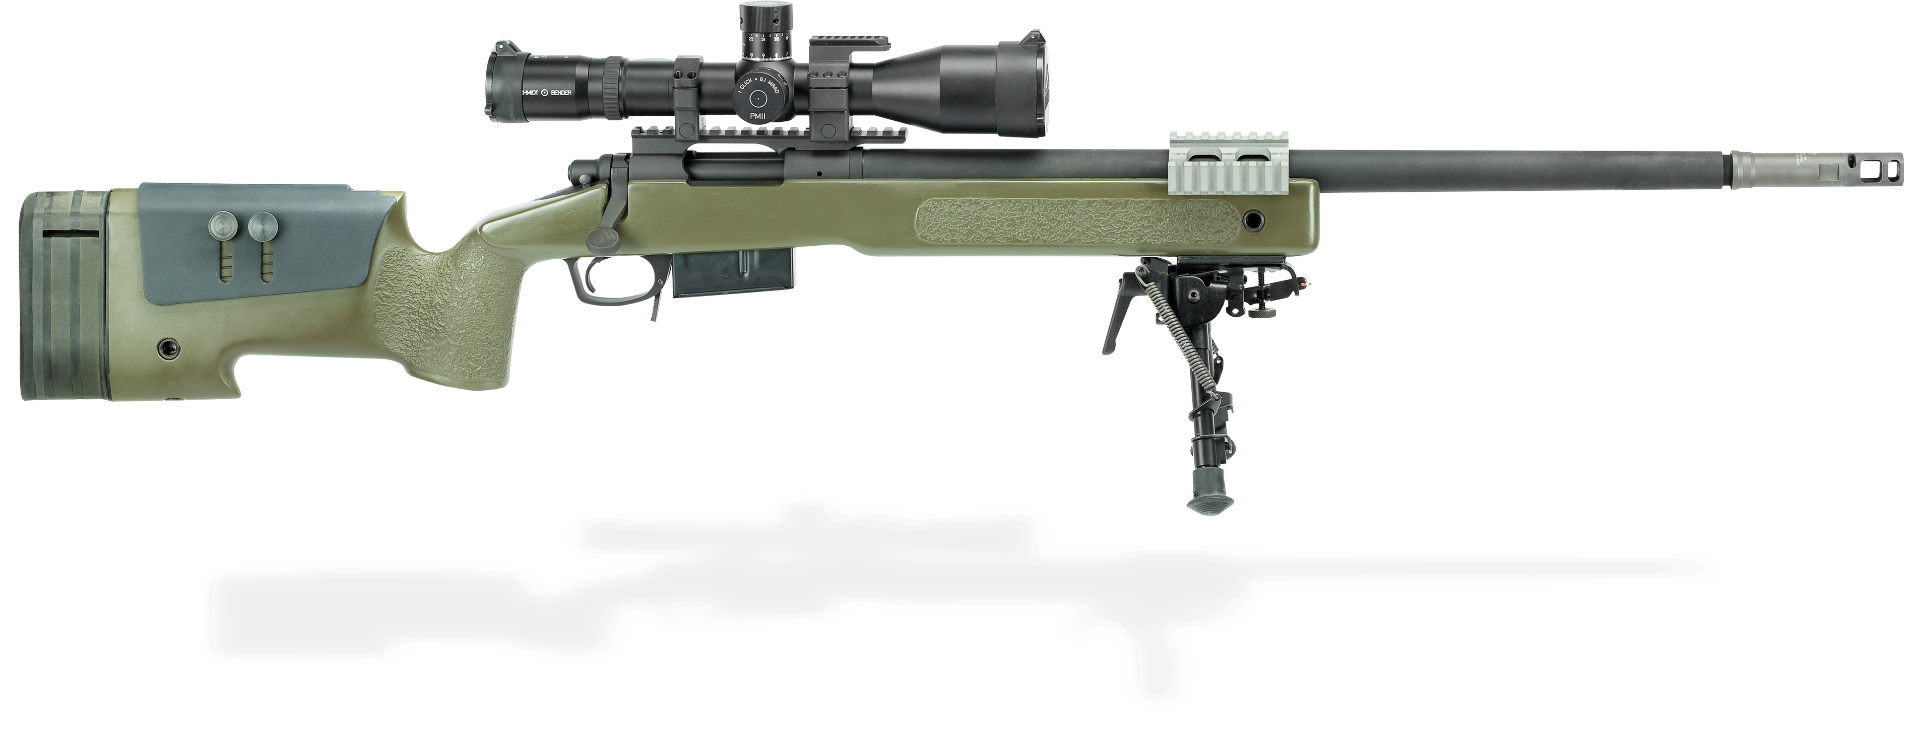 usmc m40a5